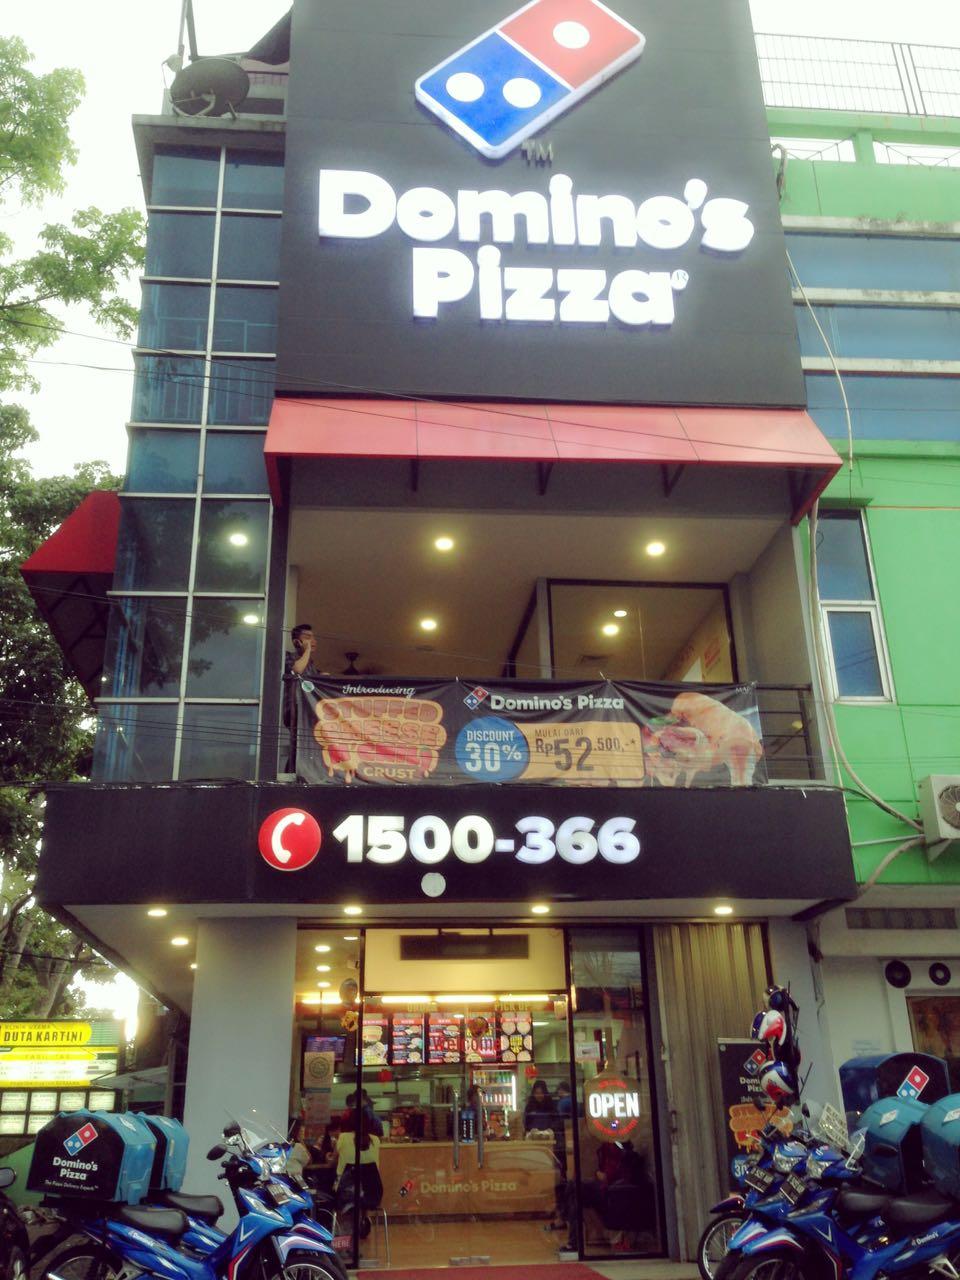 Domino's Pizza - Kec Andir, Bandung